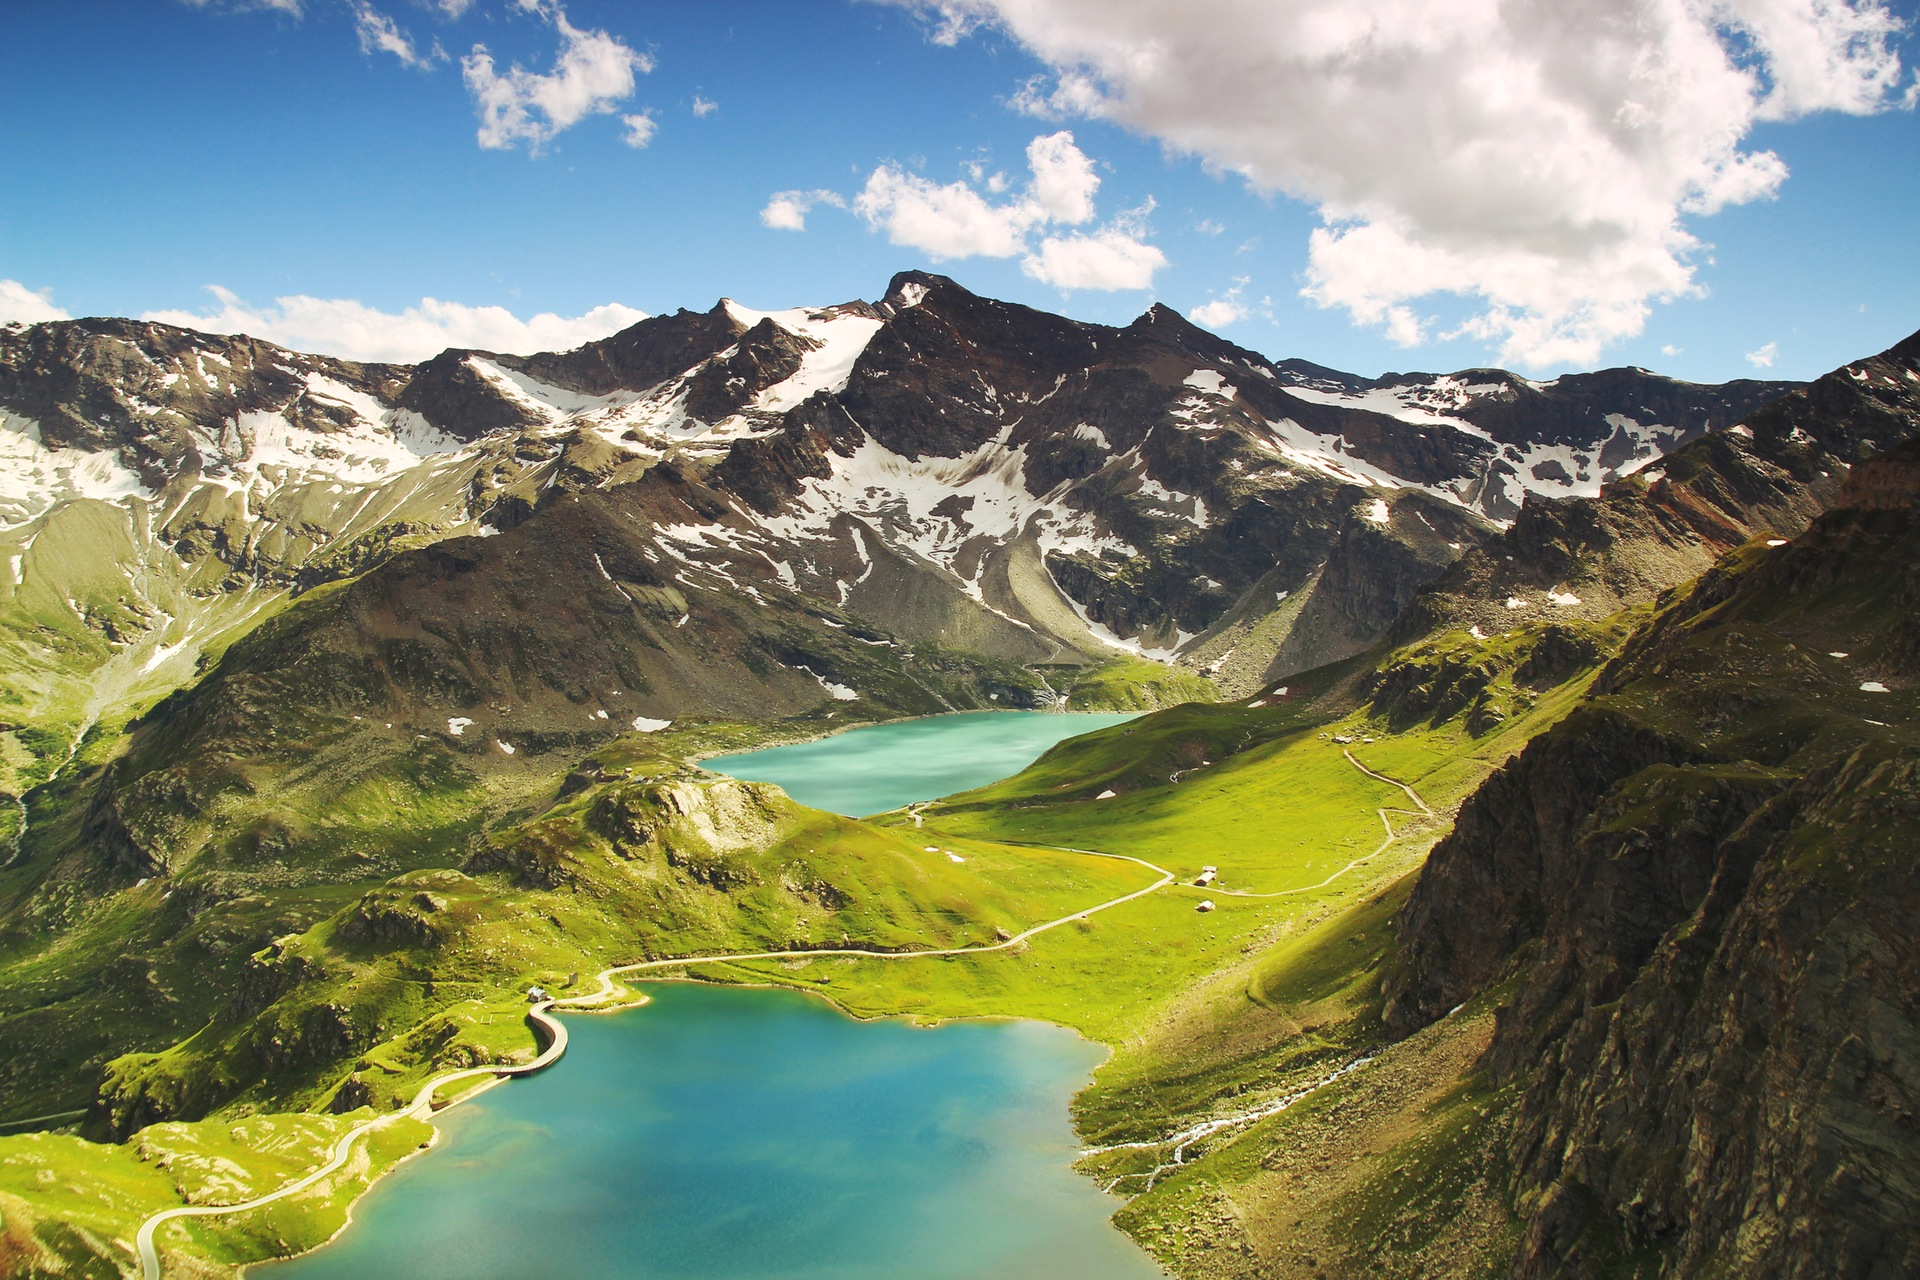 montañas, pradera, lago, nieve, italia, paisaje, vista aérea - Fondos de Pantalla HD - professor-falken.com